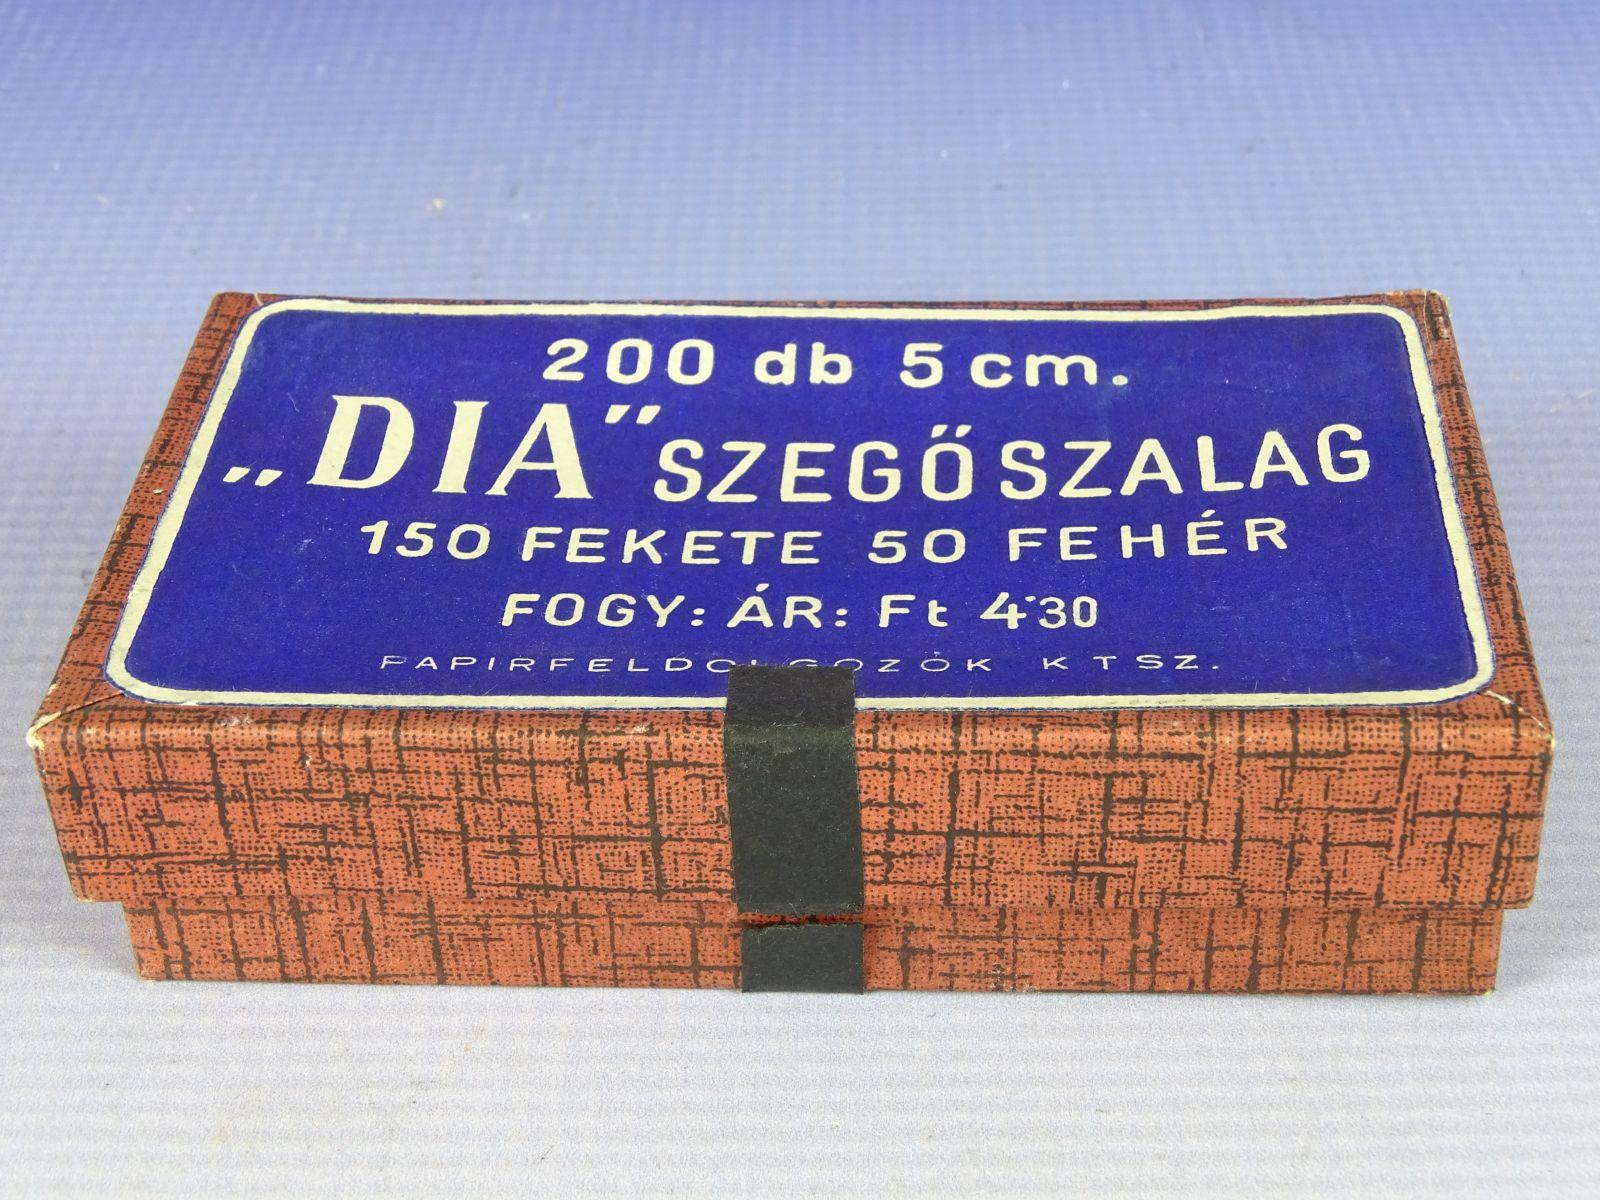 DSC00159.JPG (1600�1200)